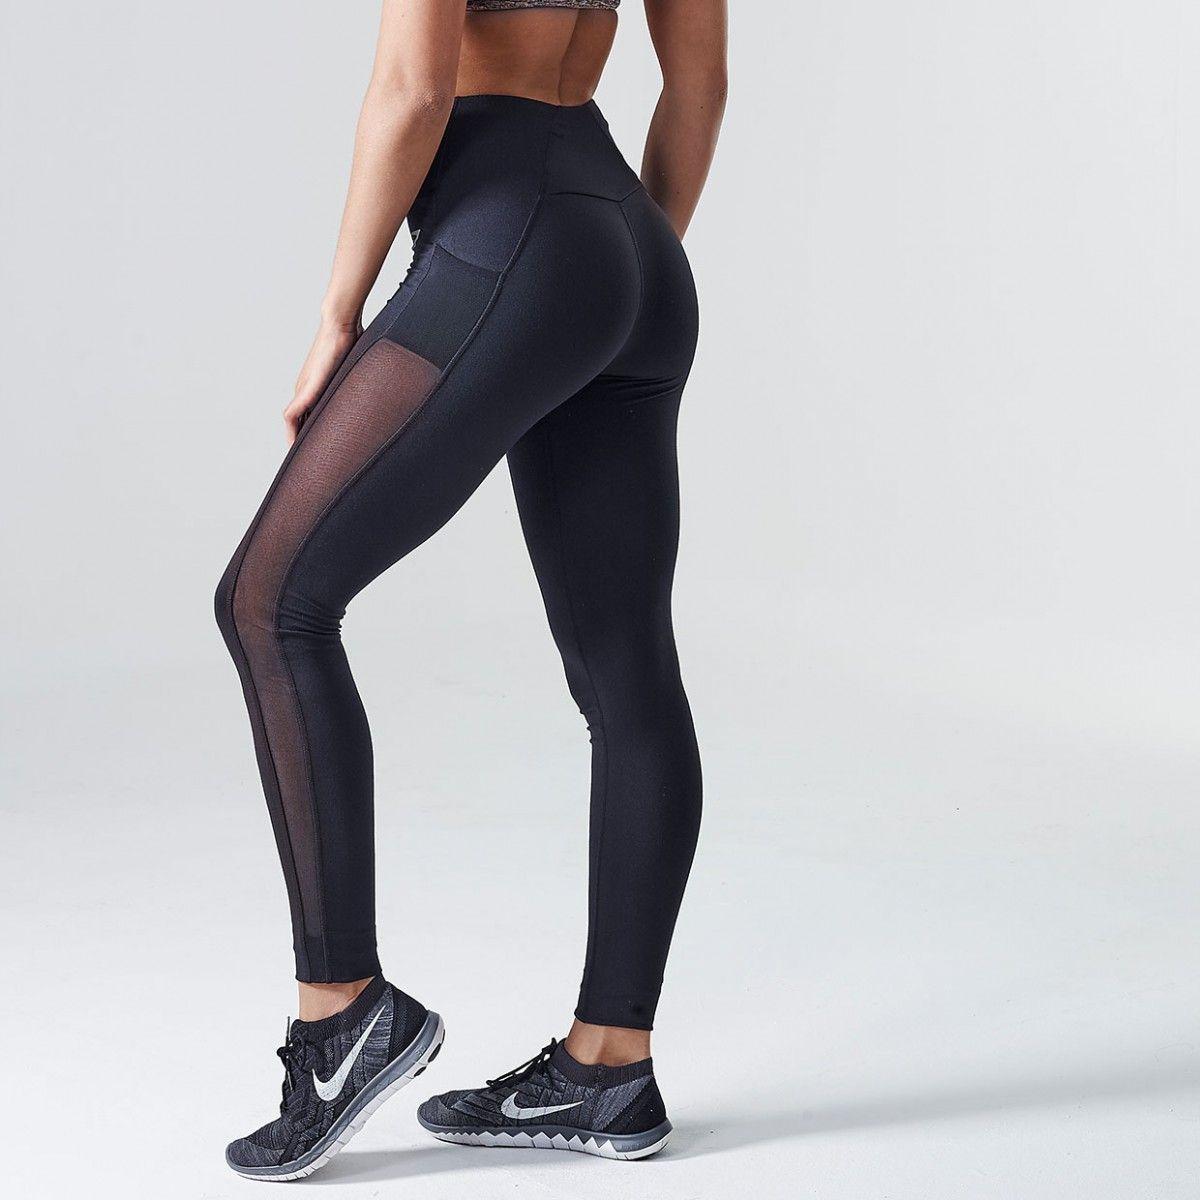 11eb4690dbd9a9 DRY Sculpture Leggings | Running Tights | Black | Gymshark | My ...